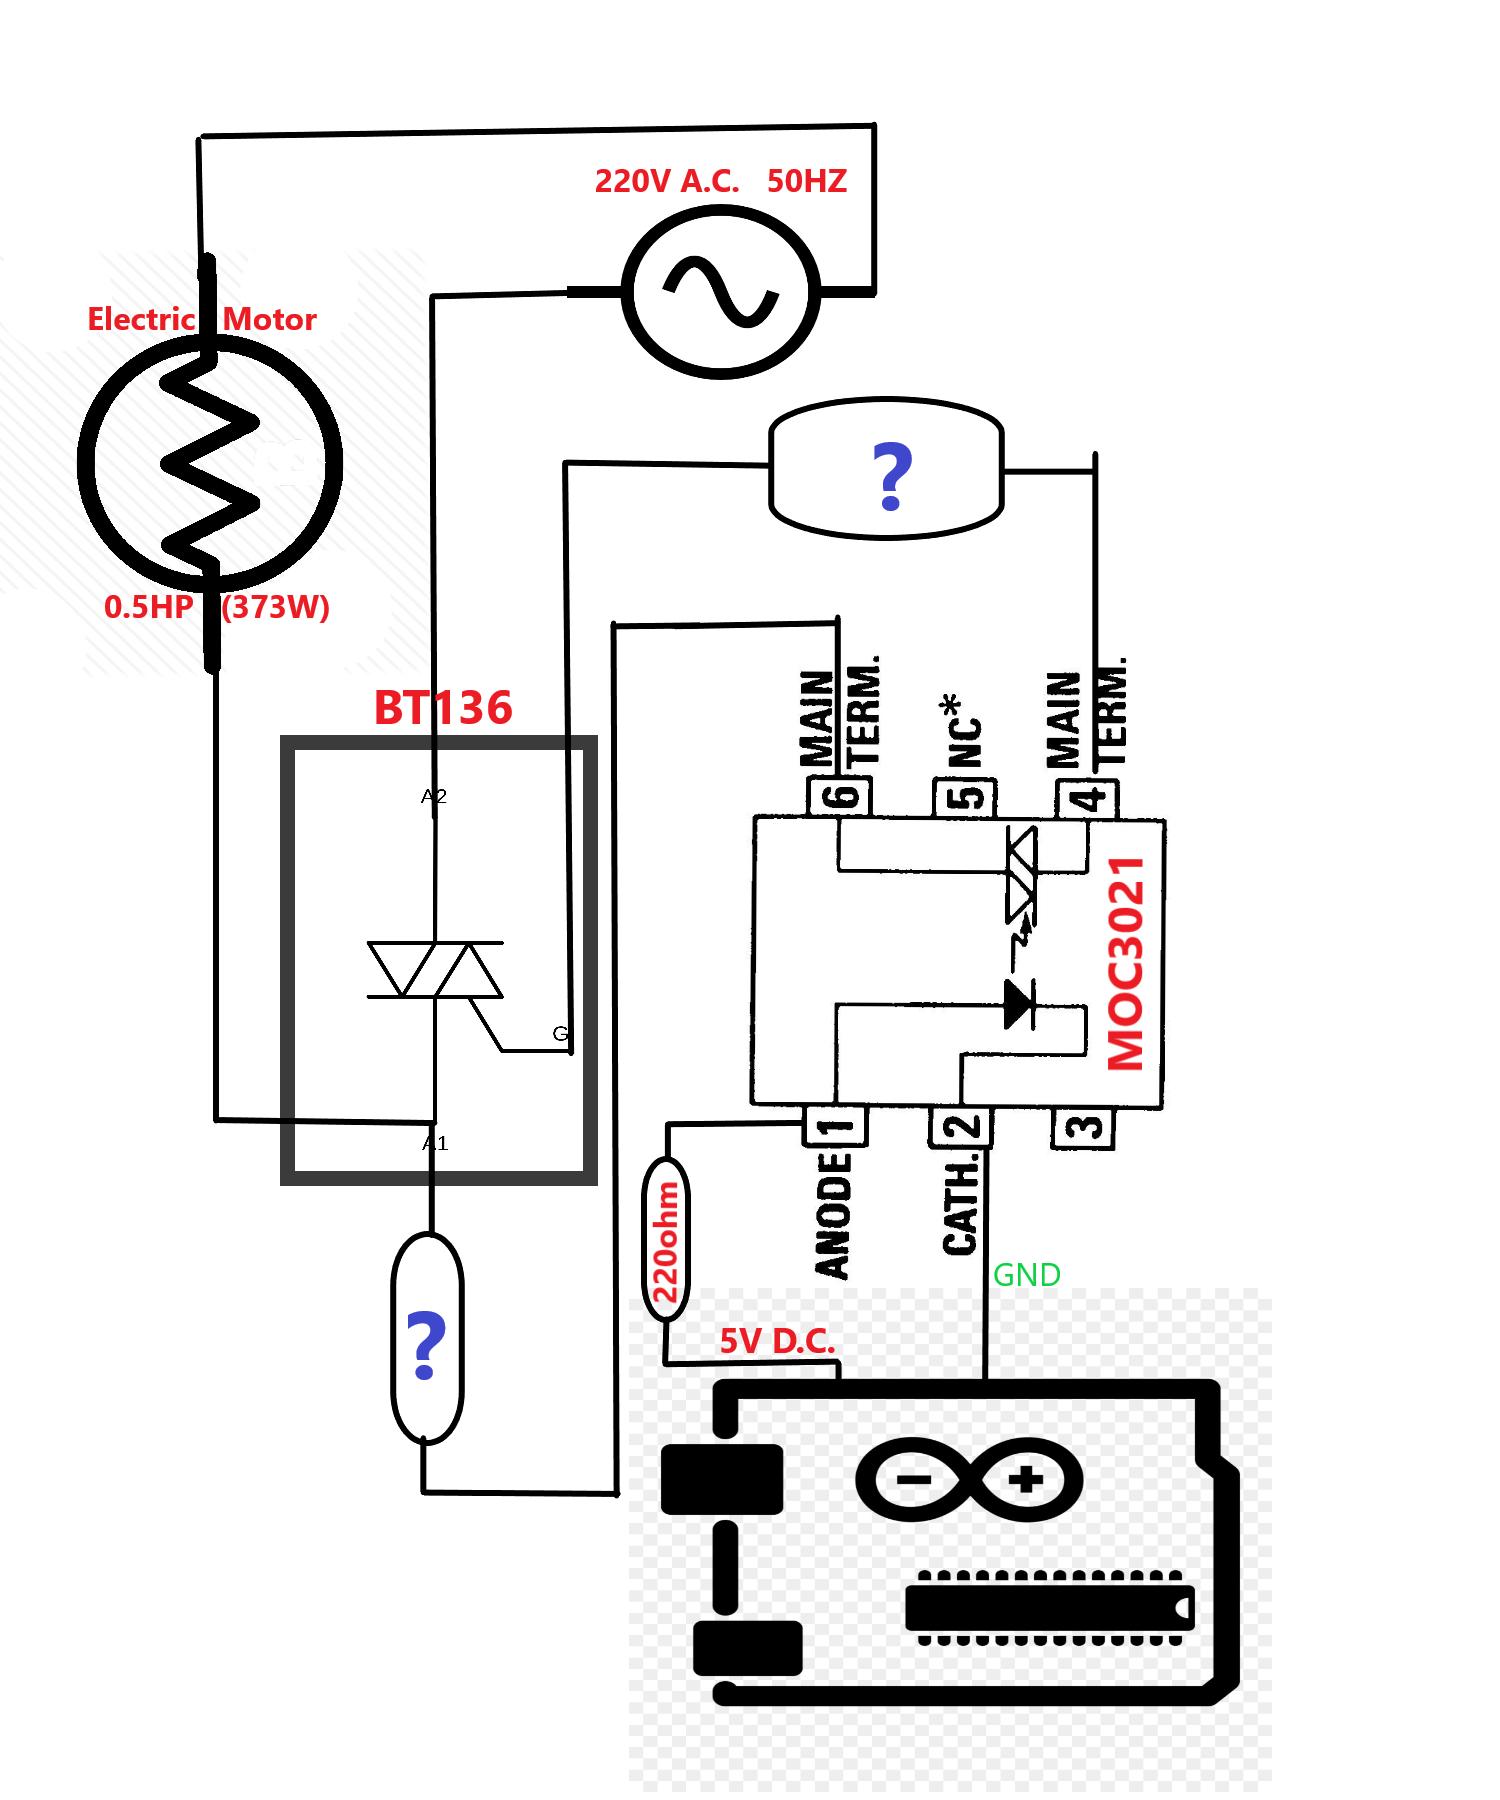 Dimmer Triac Switch Circuit Diagram | Wiring Diagram Database